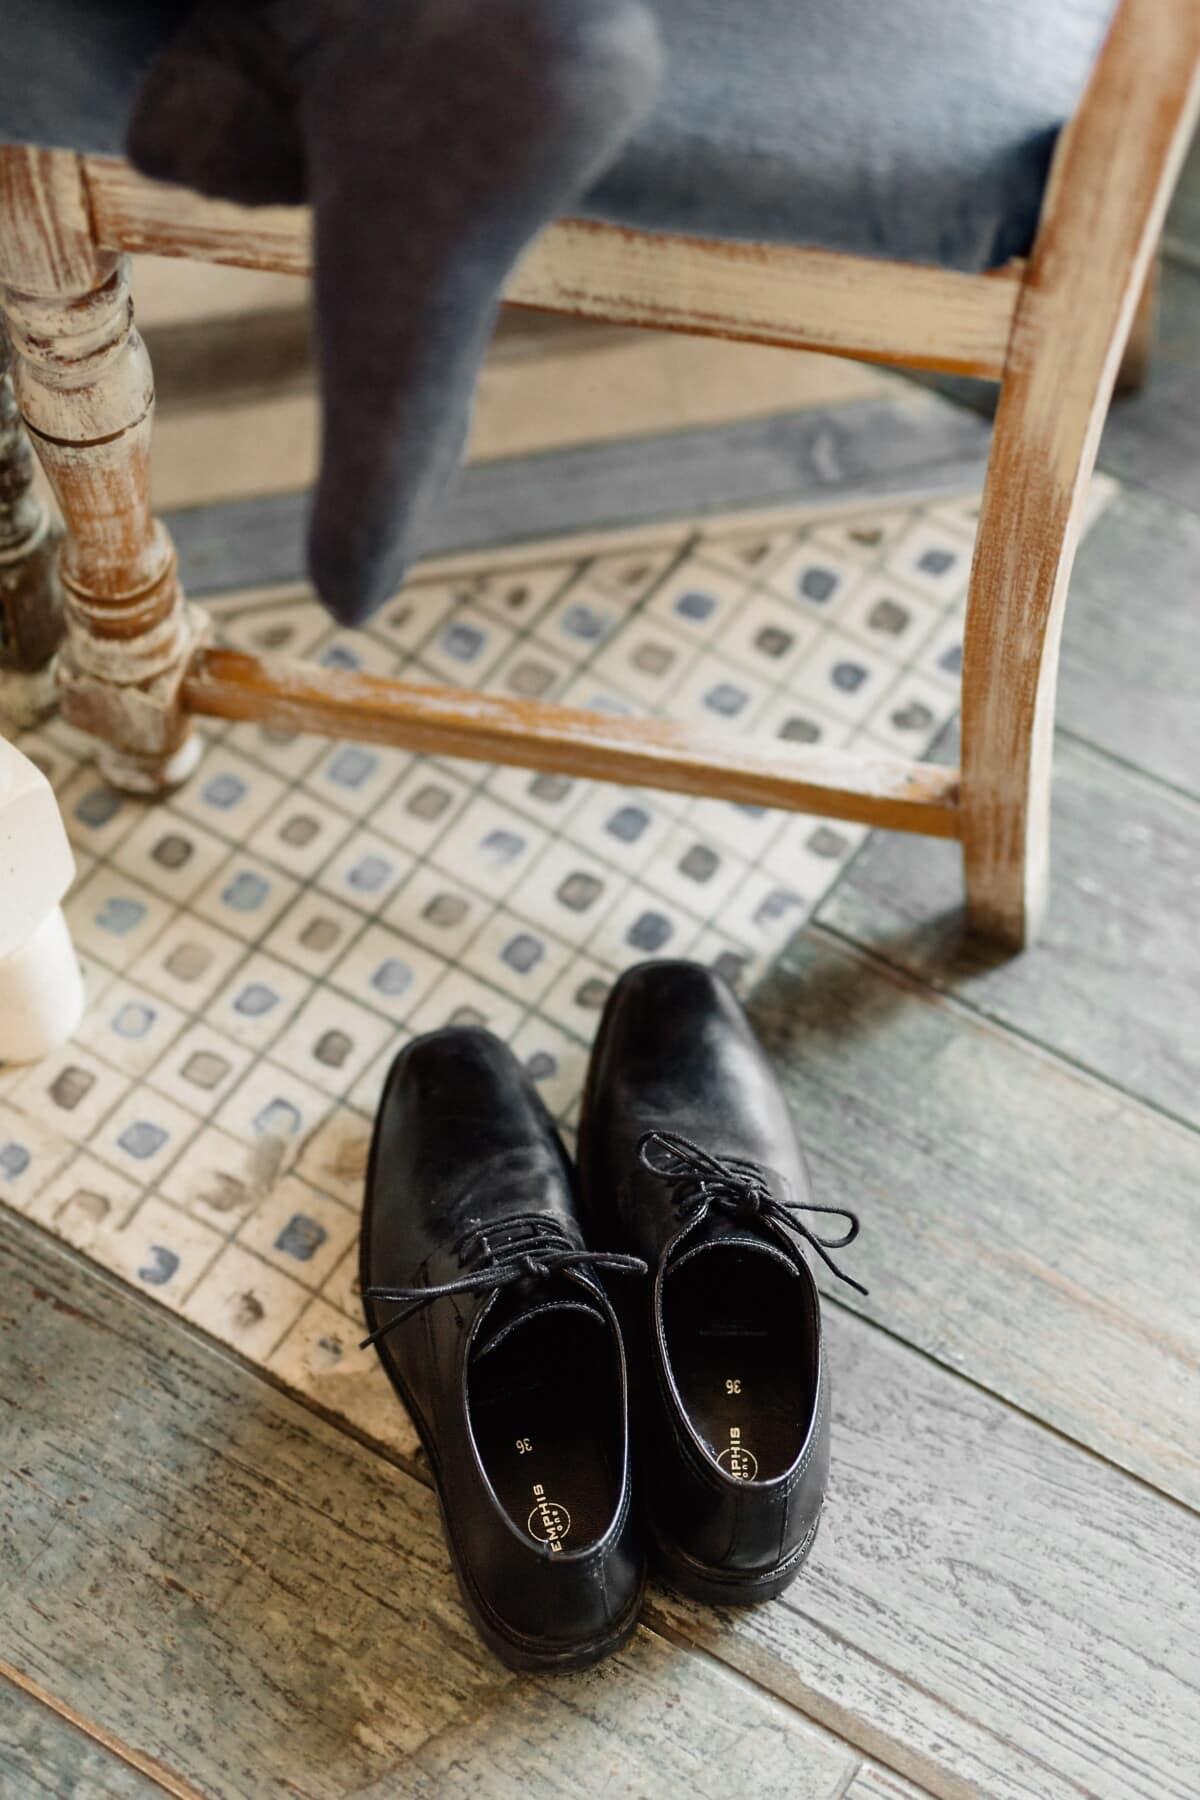 Schwarz, Schuhe, Leder, Socke, Bein, Stuhl, Stock, Hartholz, Fuß, Schuh